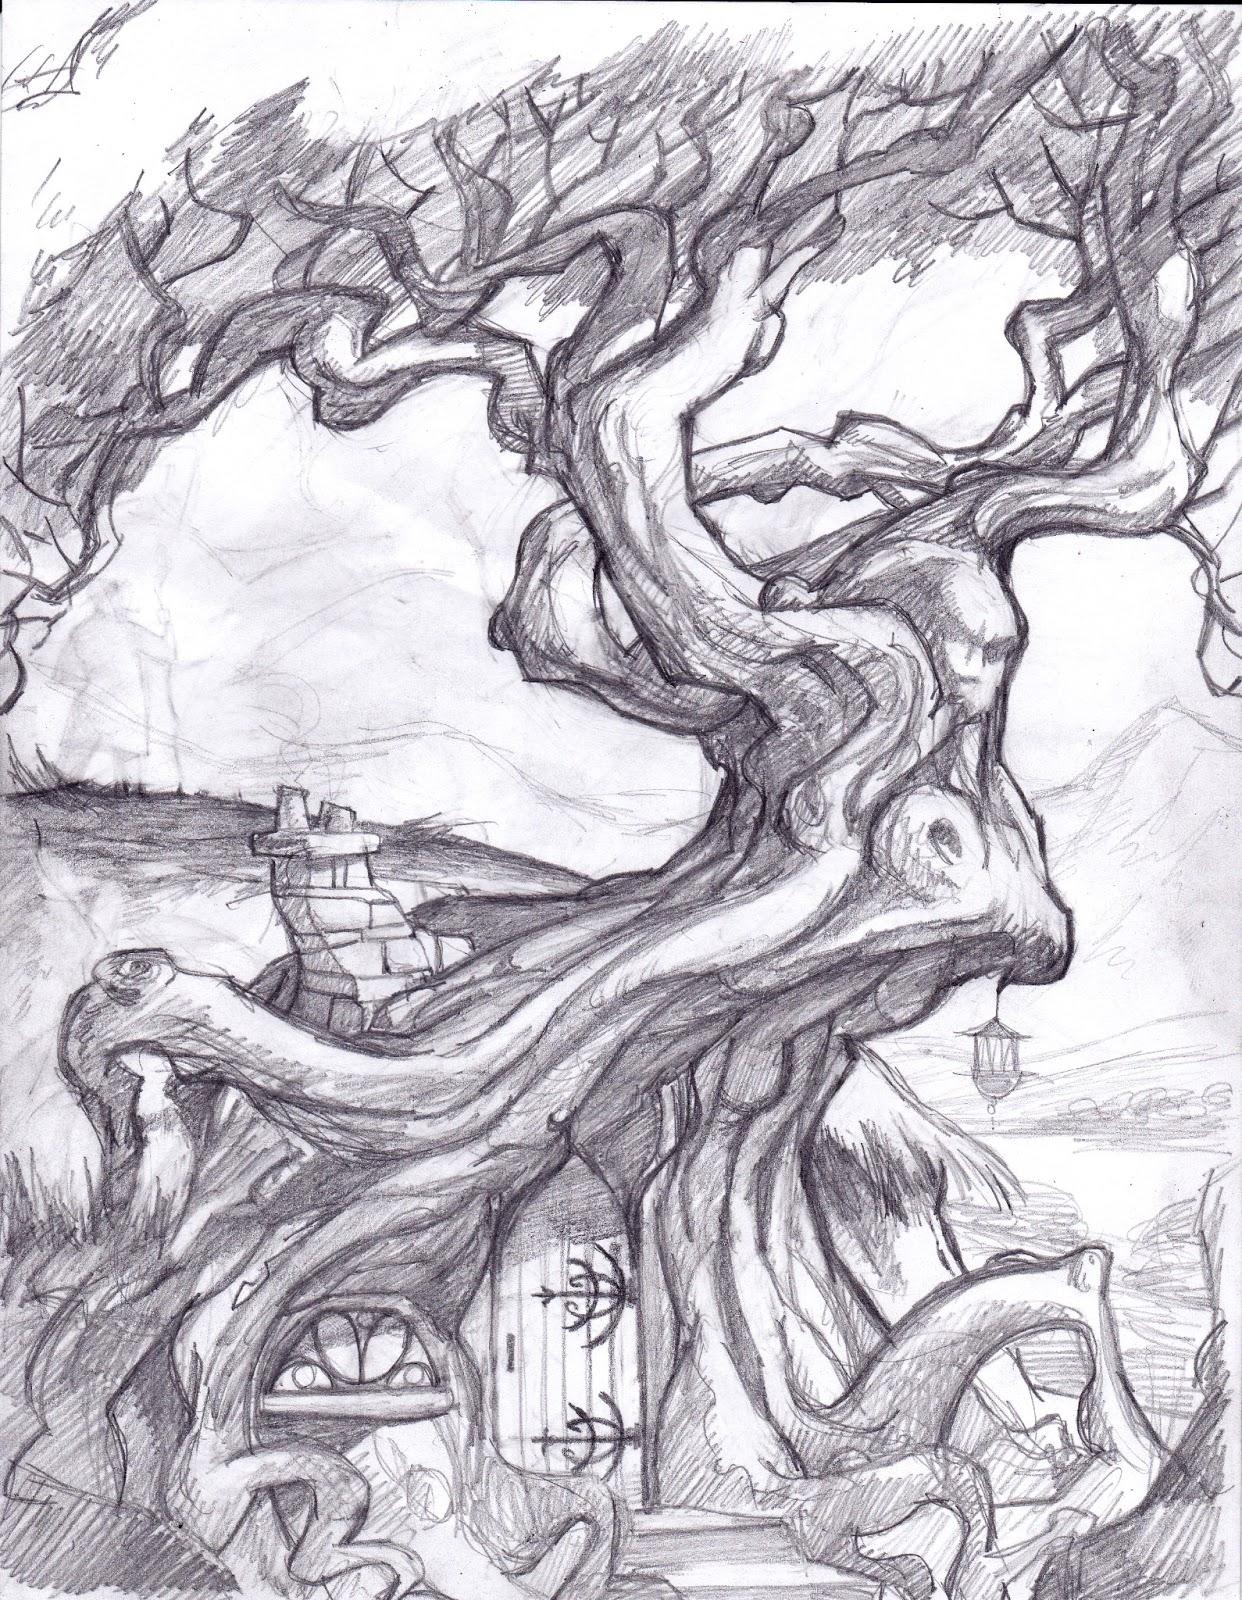 Drawn triipy dragon Tree Displaying drawing fantasy Trippy